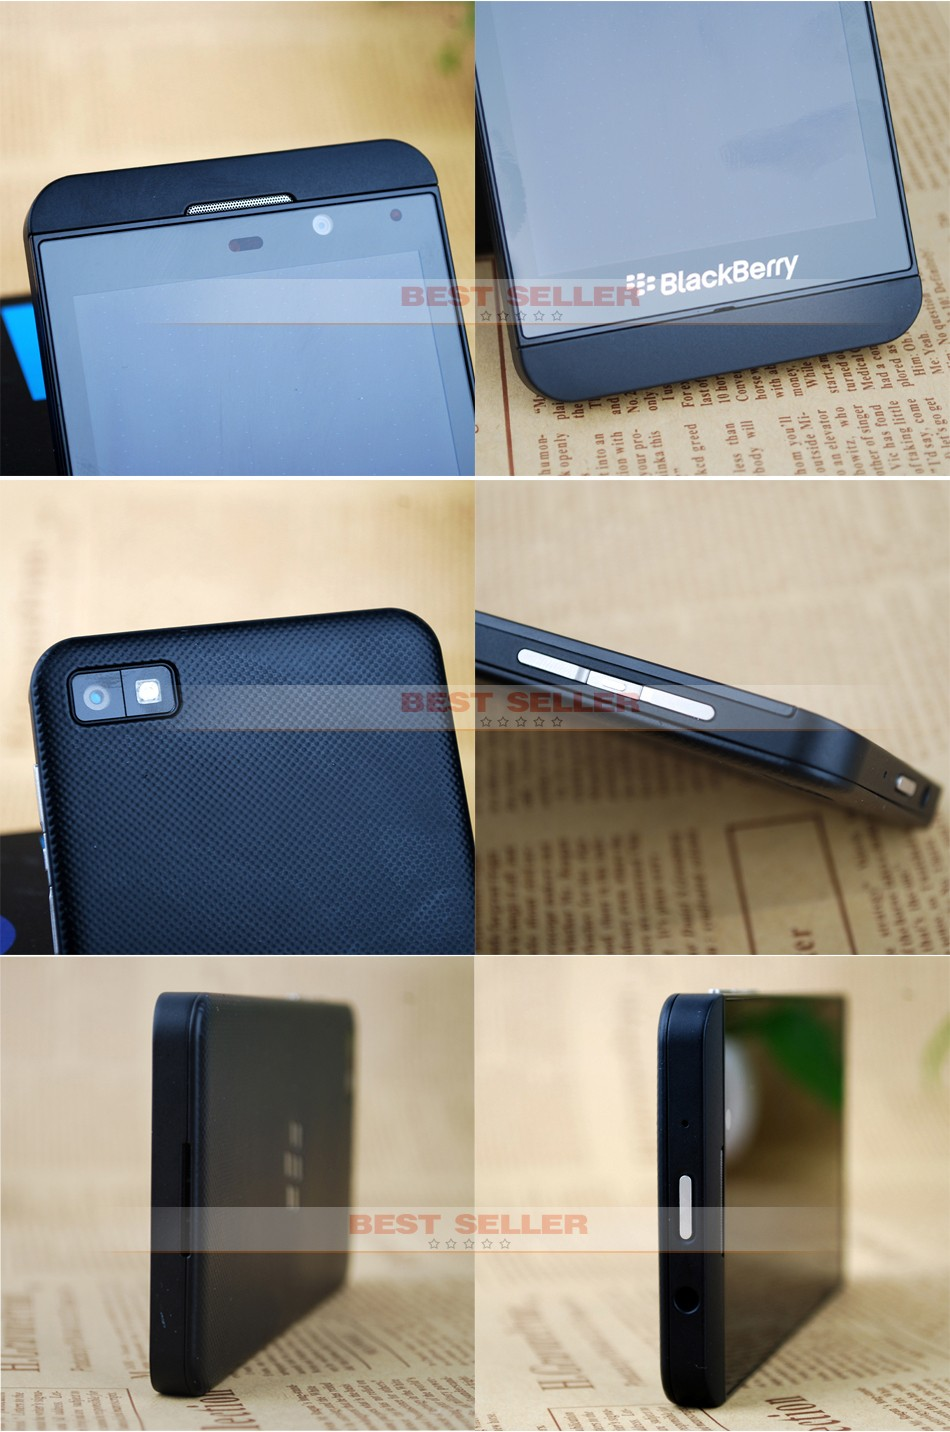 Unlocked Original Blackberry Z10 3G 4G Smartphones NFC GPS WIFI 4.2 inch Touch Mobile Phones 2+16GB white 4